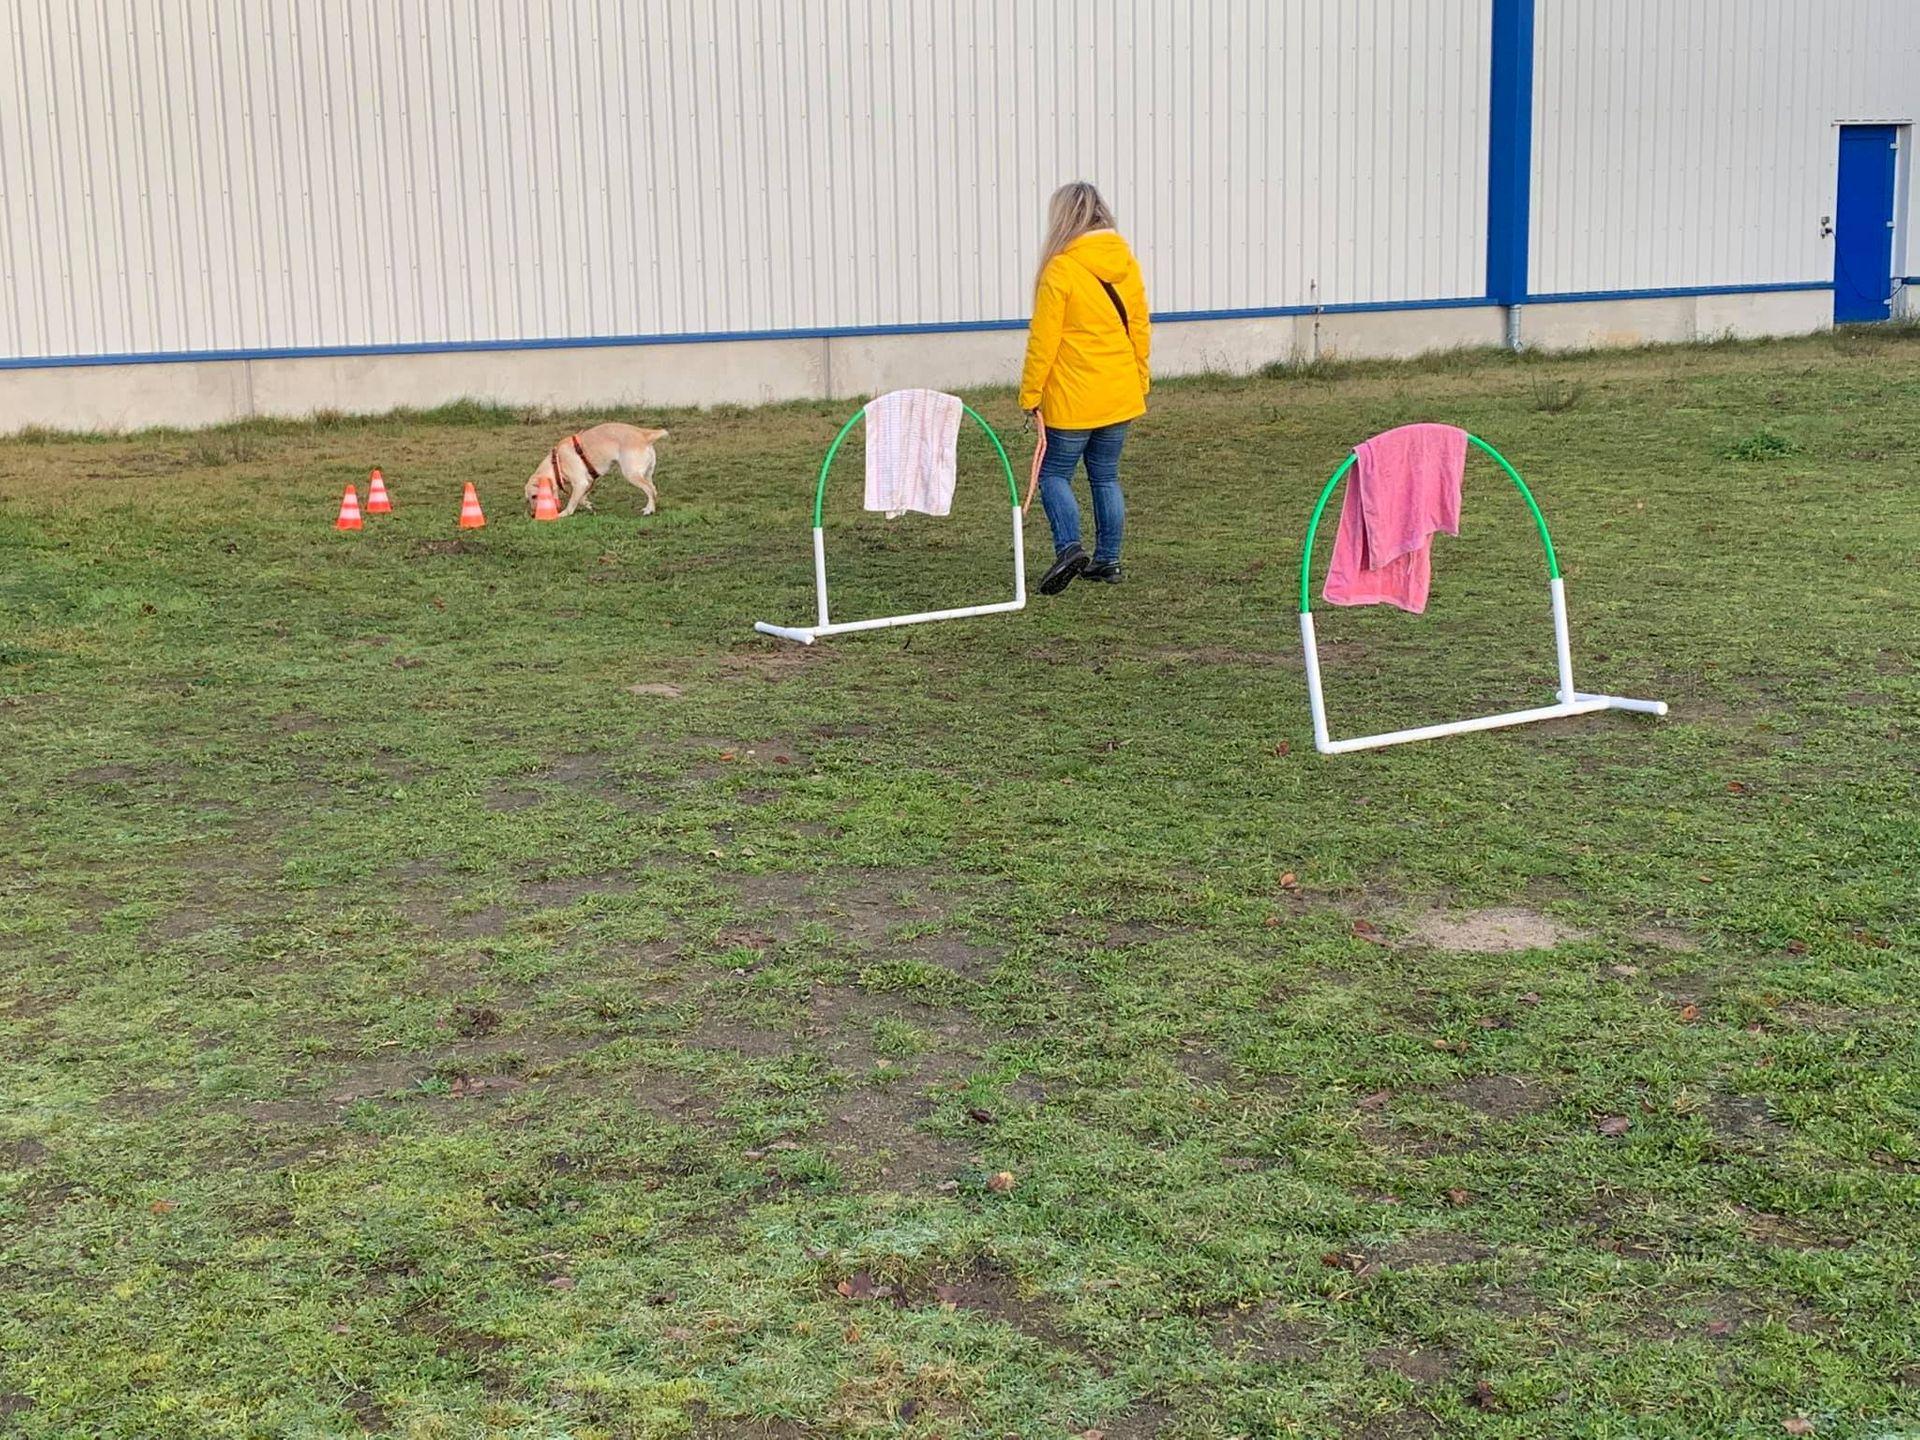 Hundeausbildungszentrum Emsland HAZE in Bildern